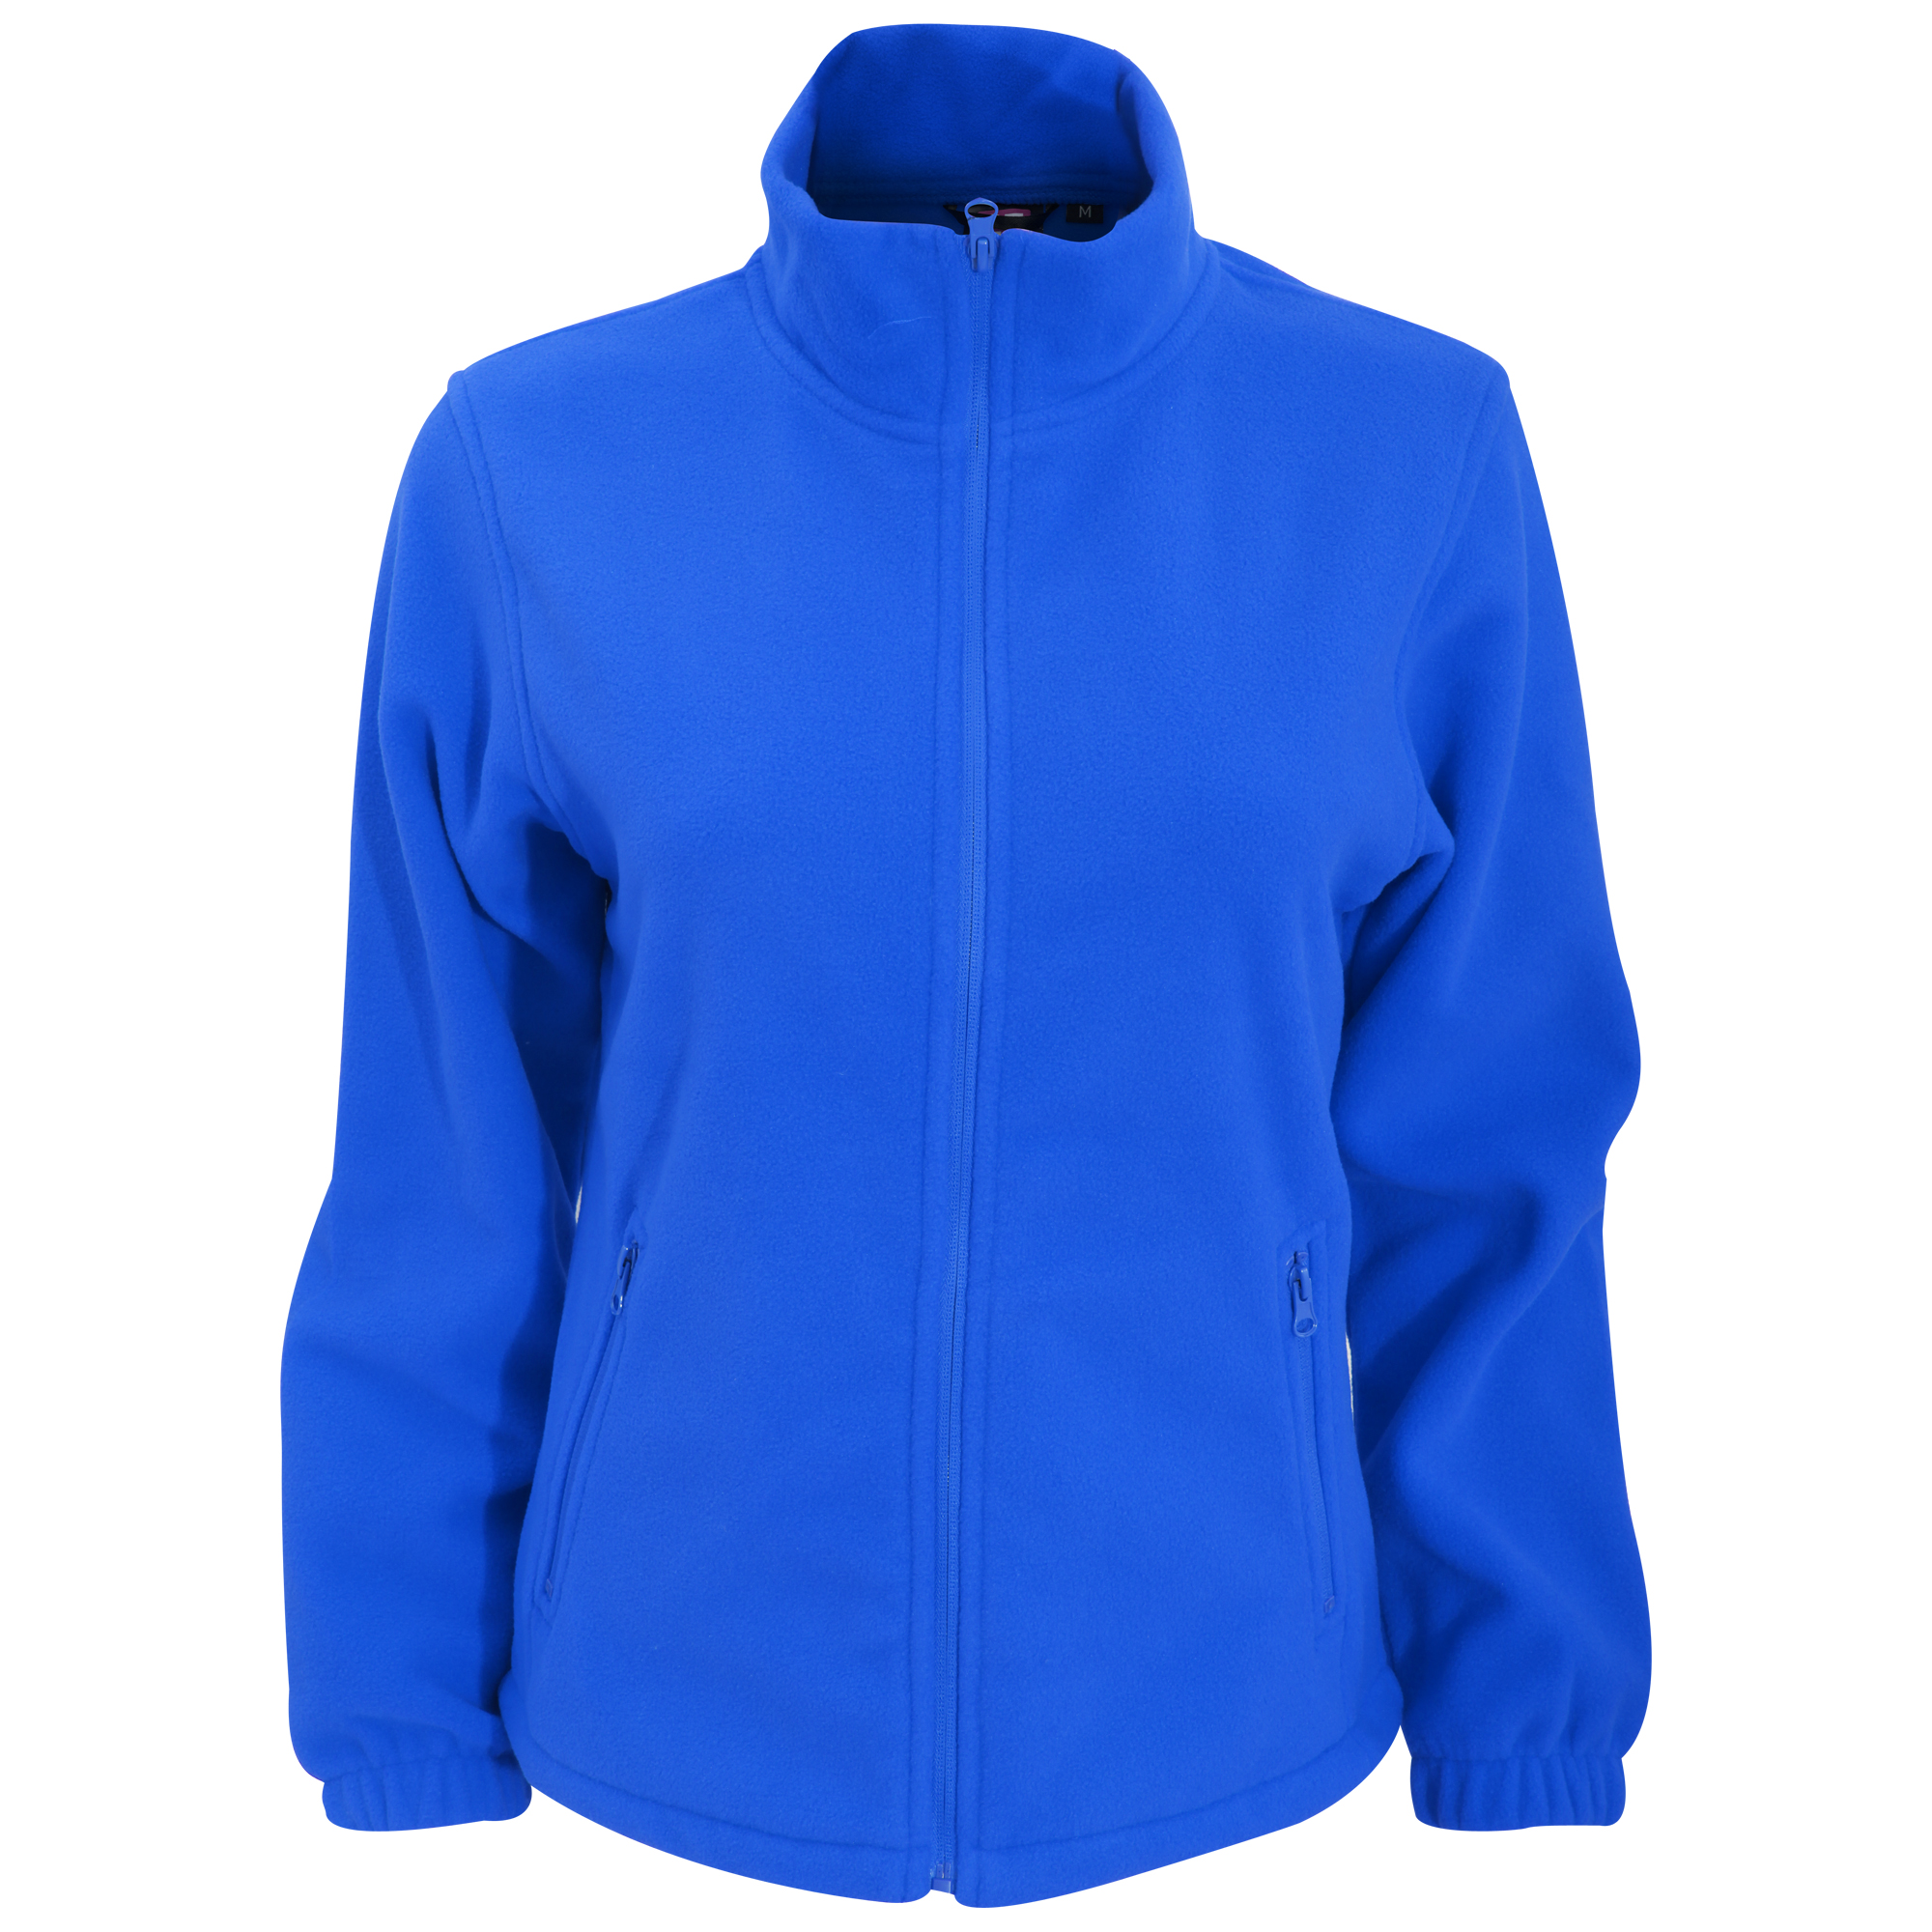 2786 Womens/Ladies Full Zip Fleece Jacket (280 GSM) (S) (Royal)